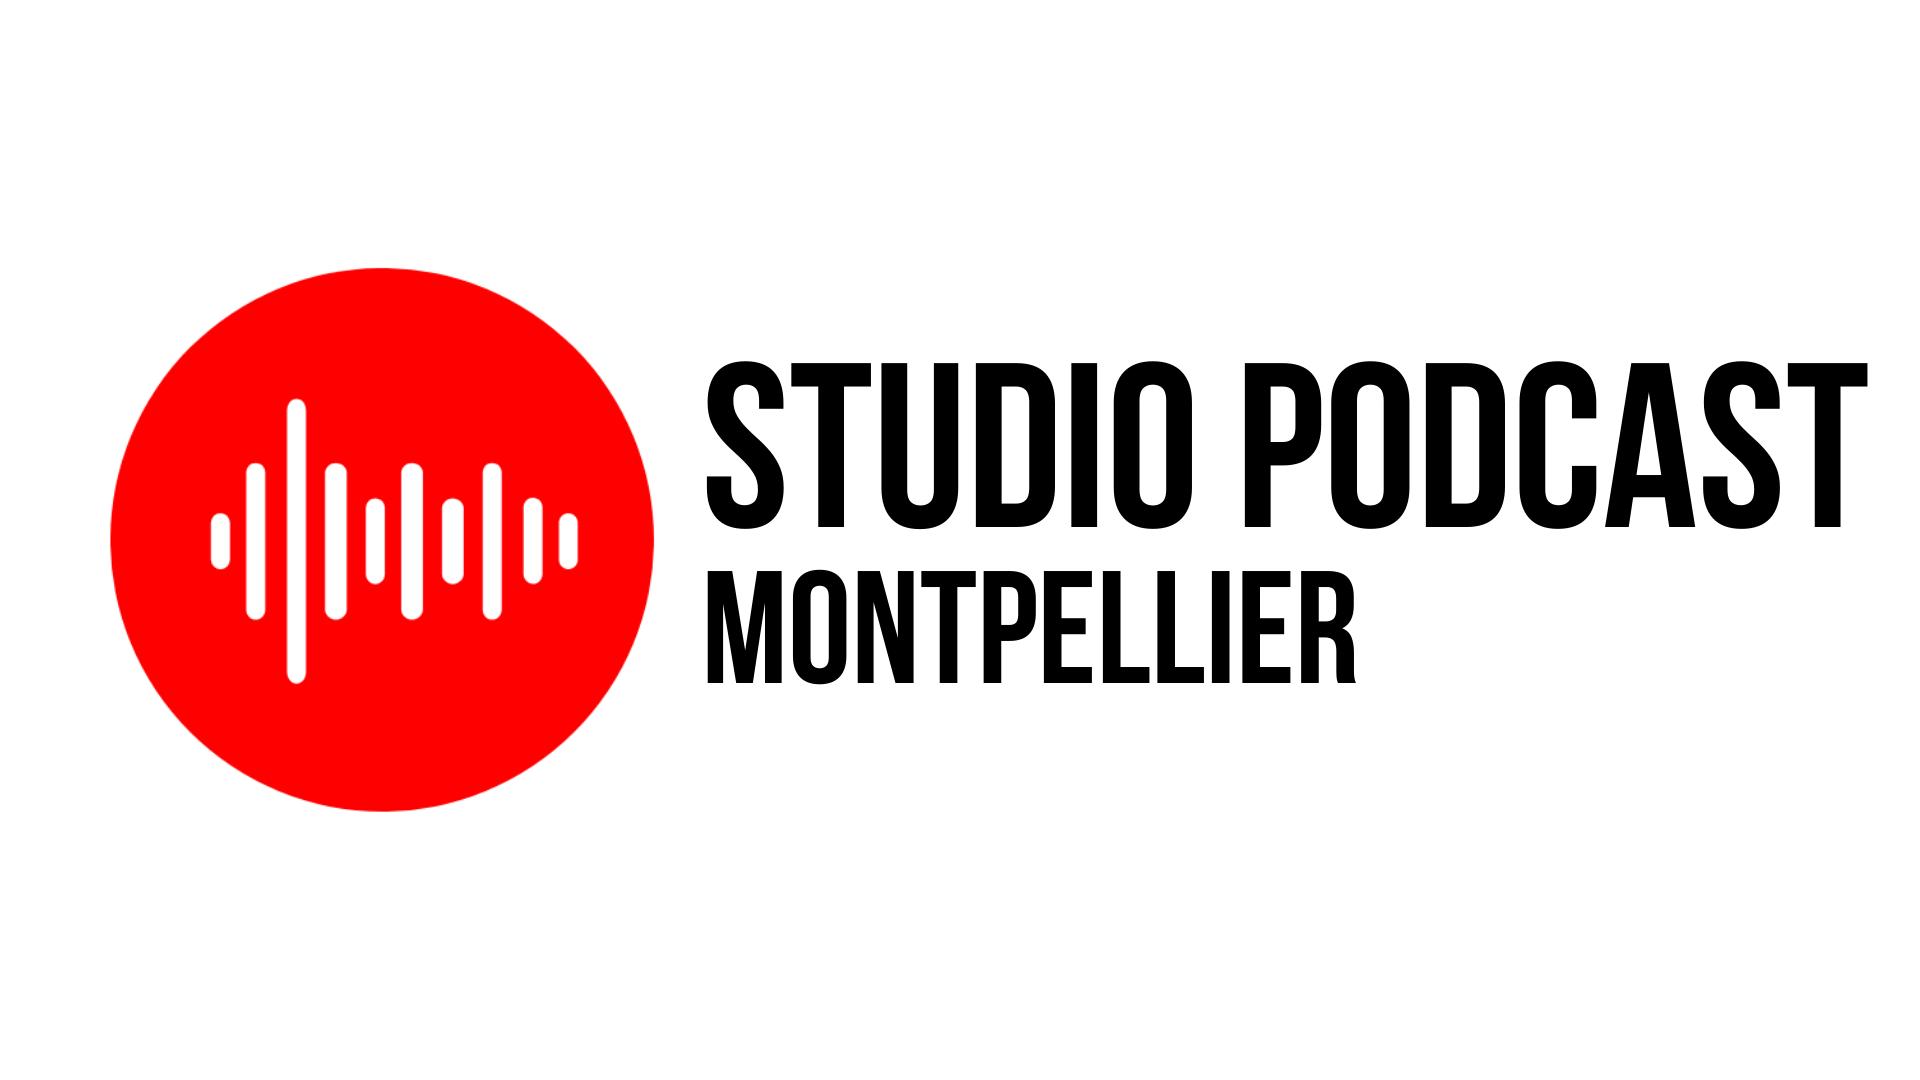 Studio Podcast Montpellier